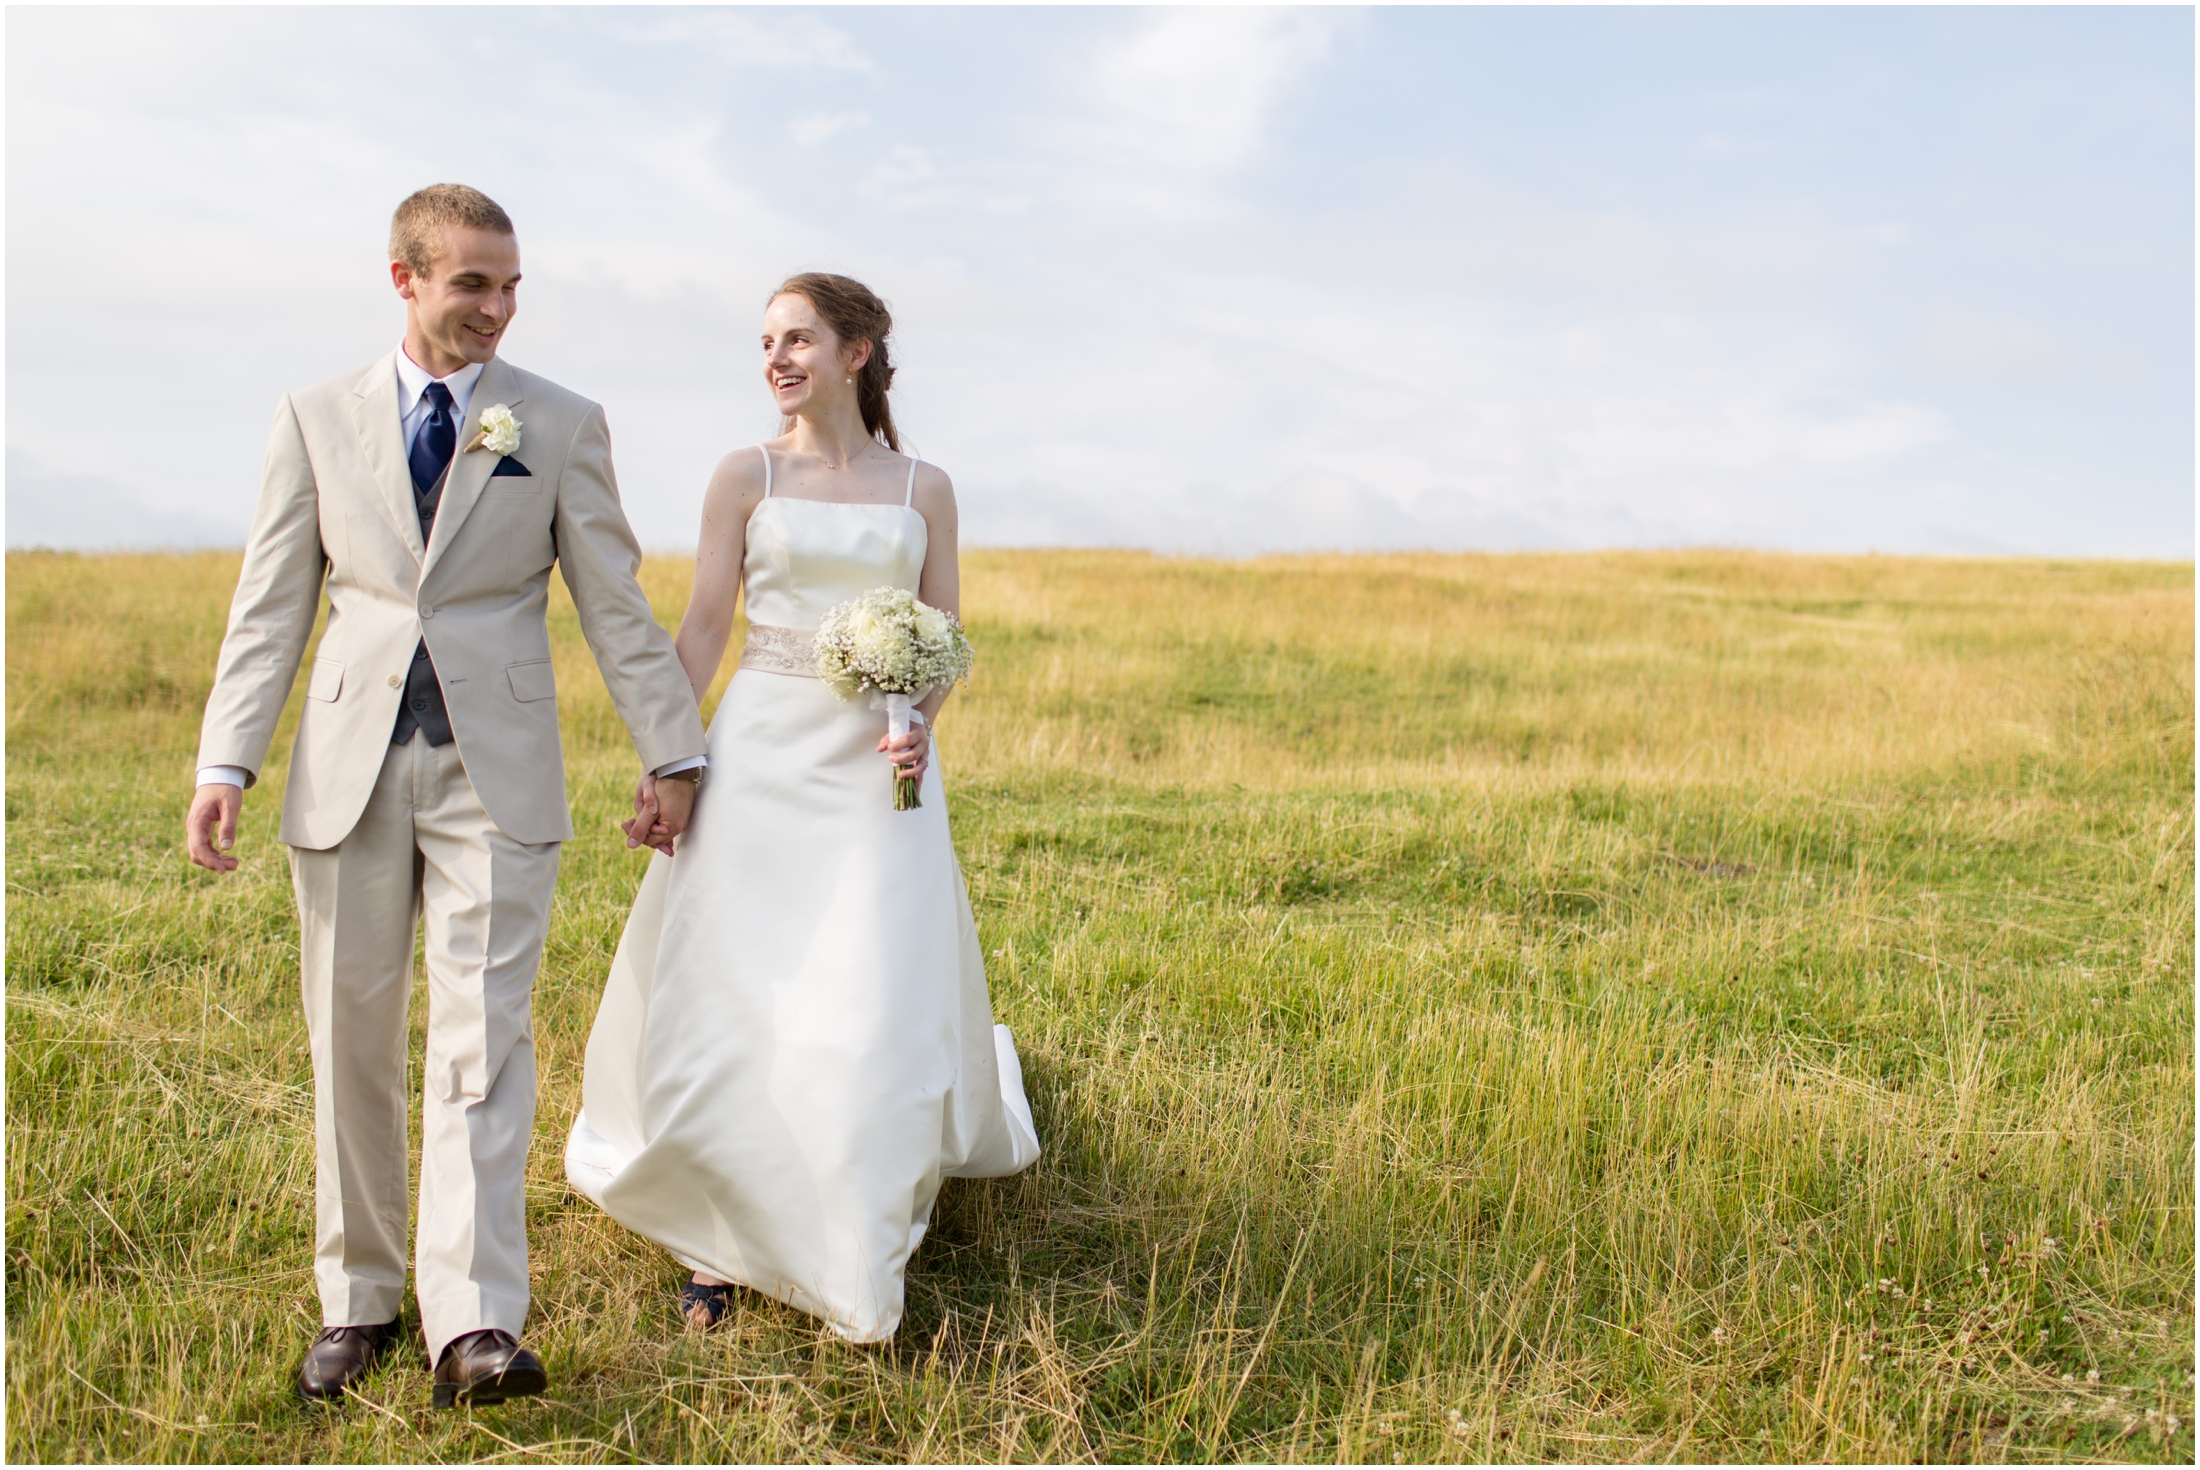 Nash-Wedding-Bride-and-Groom-Portraits-1032.jpg